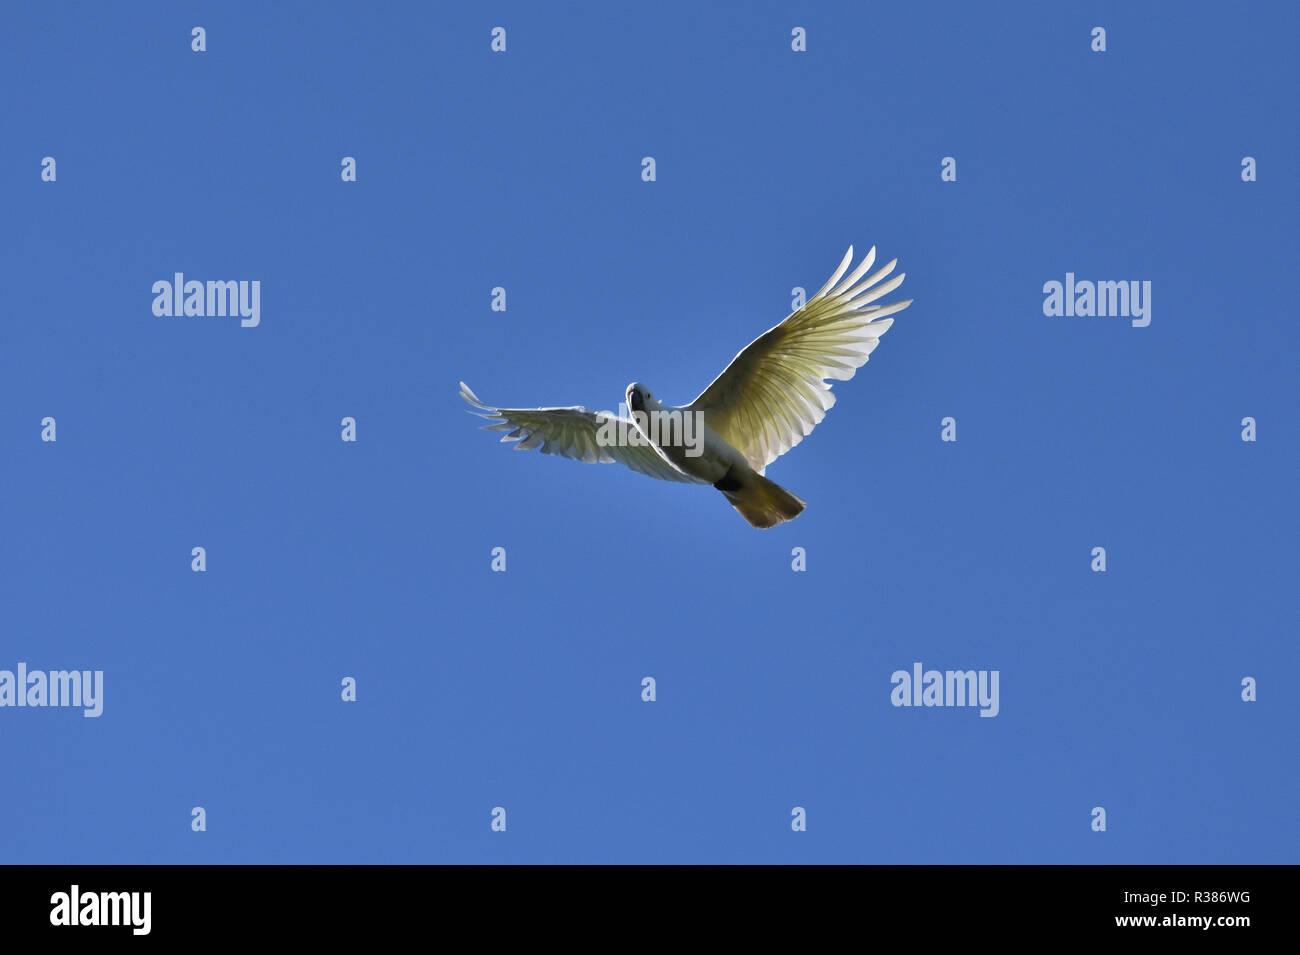 An Australian, Queensland Sulphur-crested Cockatoo ( Cacatua galerita ) flying high above - Stock Image